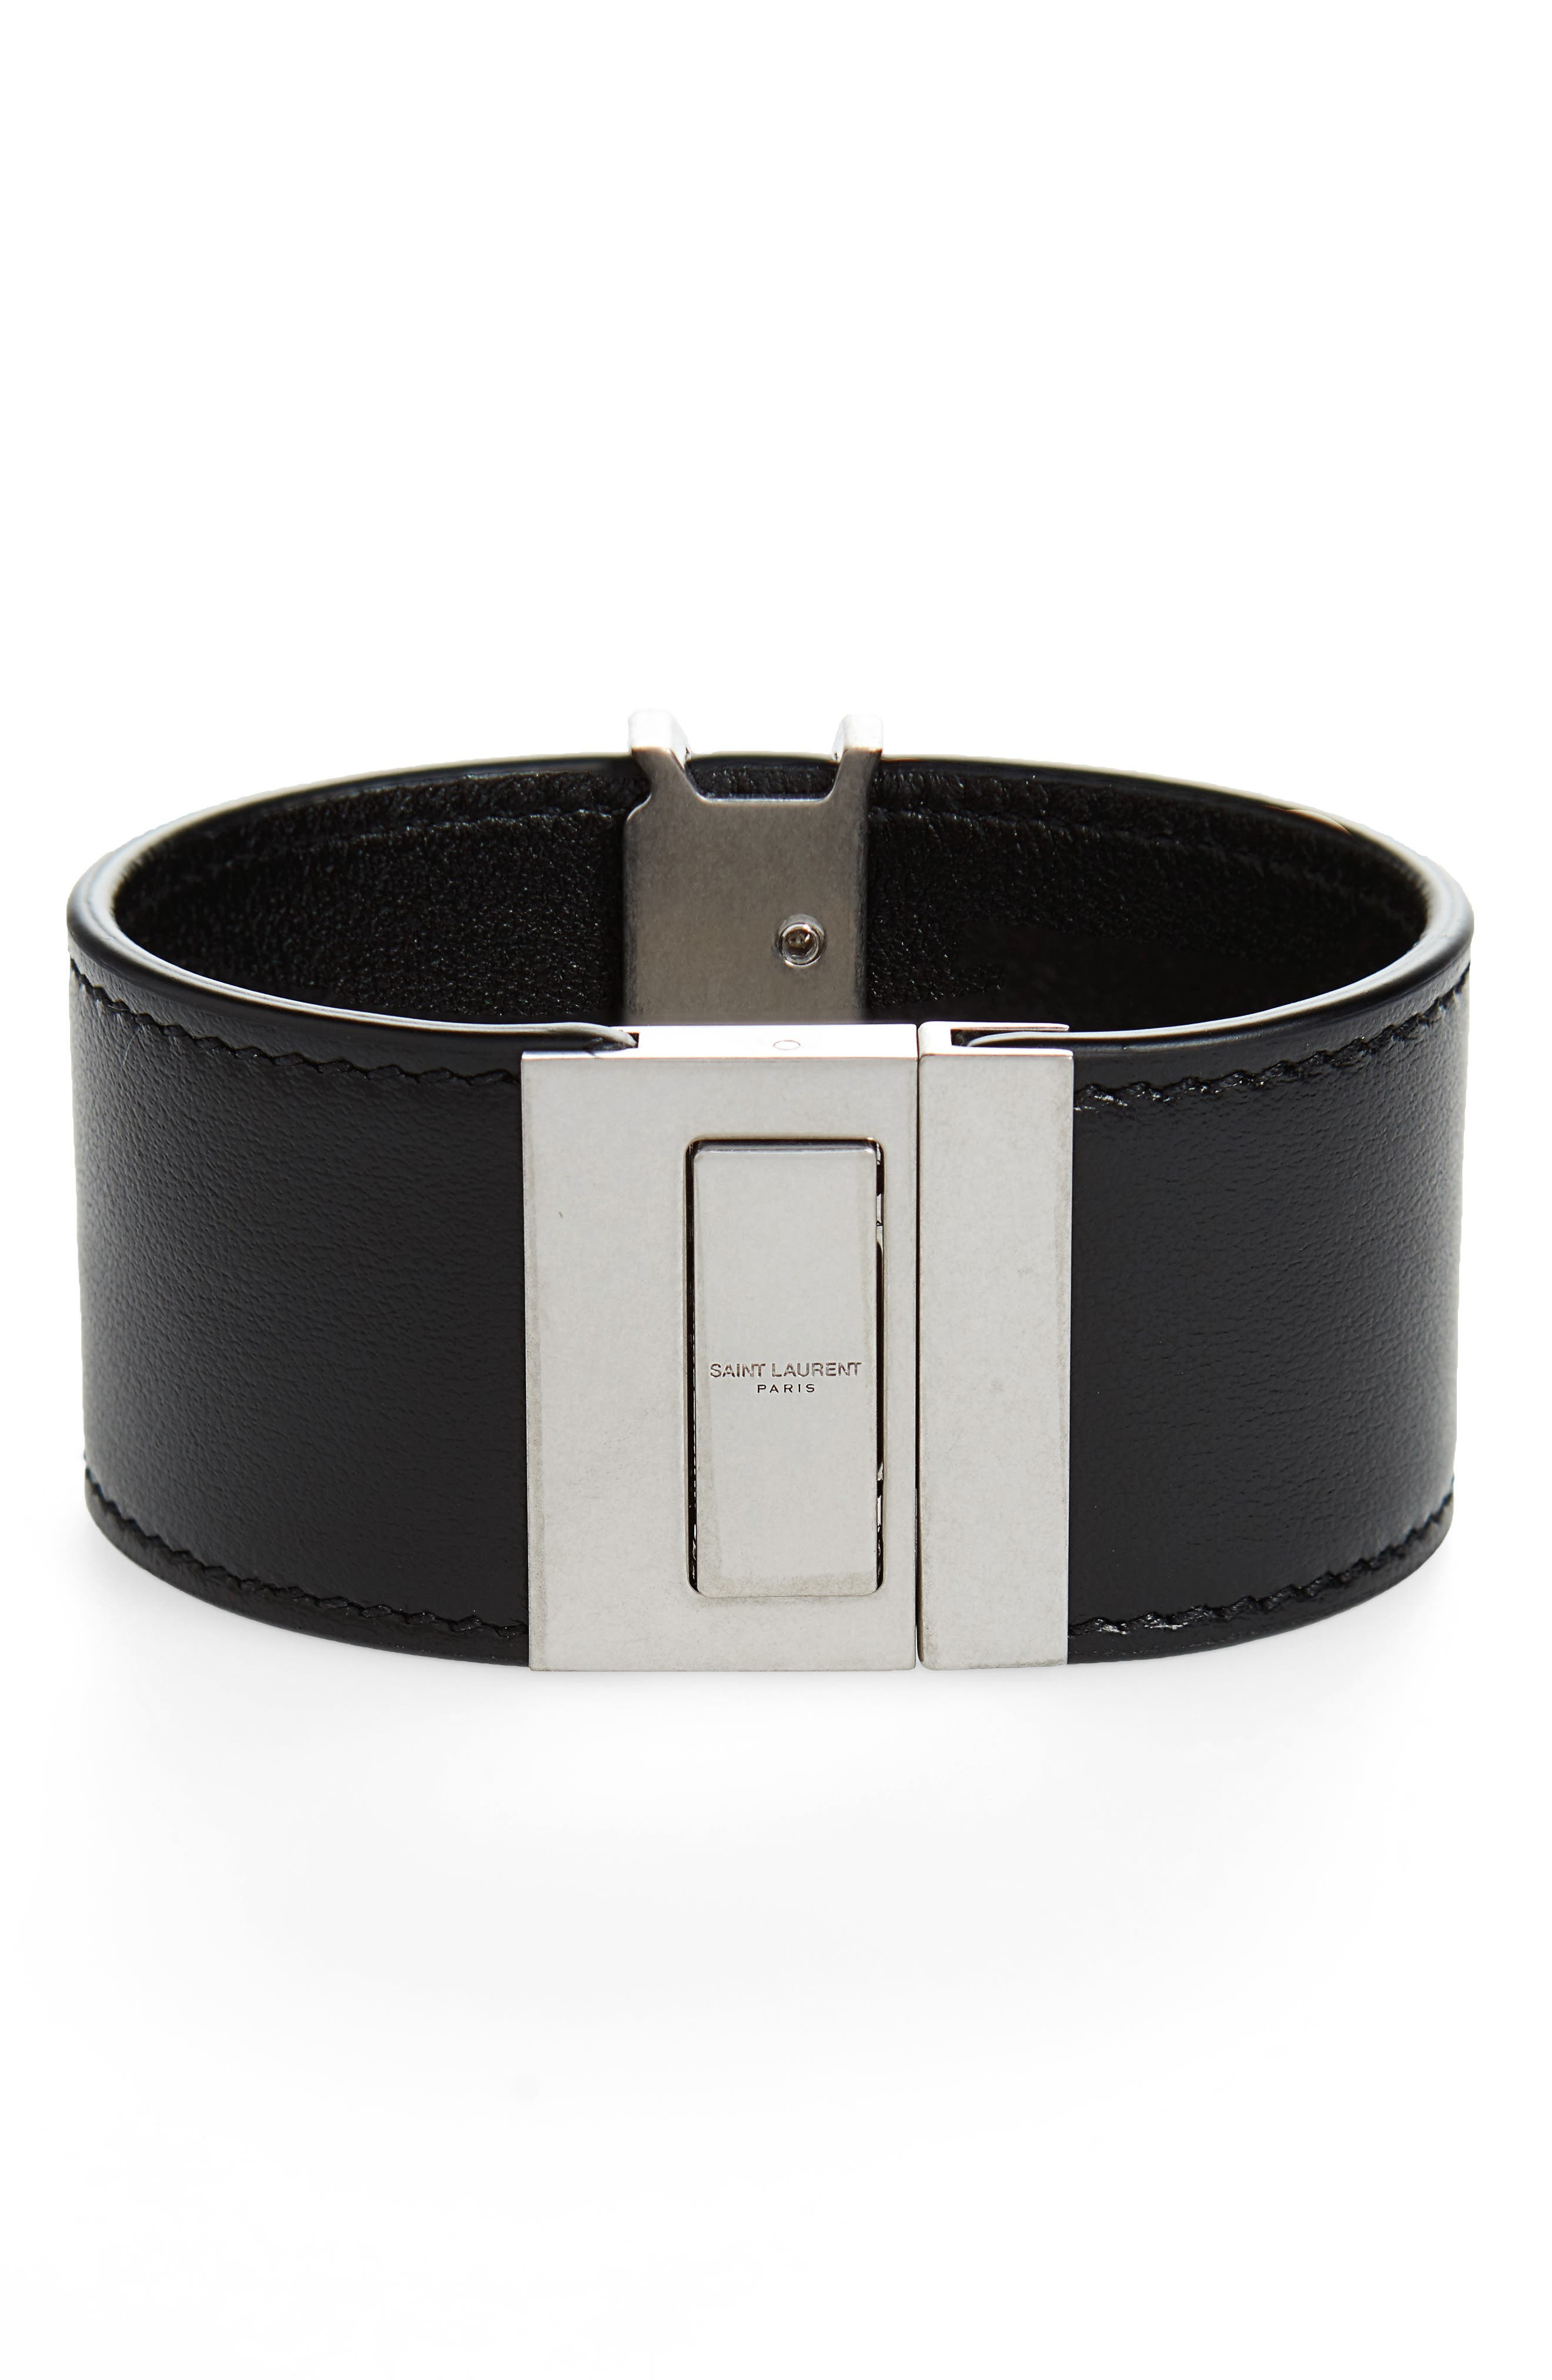 Leather Cuff Bracelet,                             Main thumbnail 1, color,                             NERO